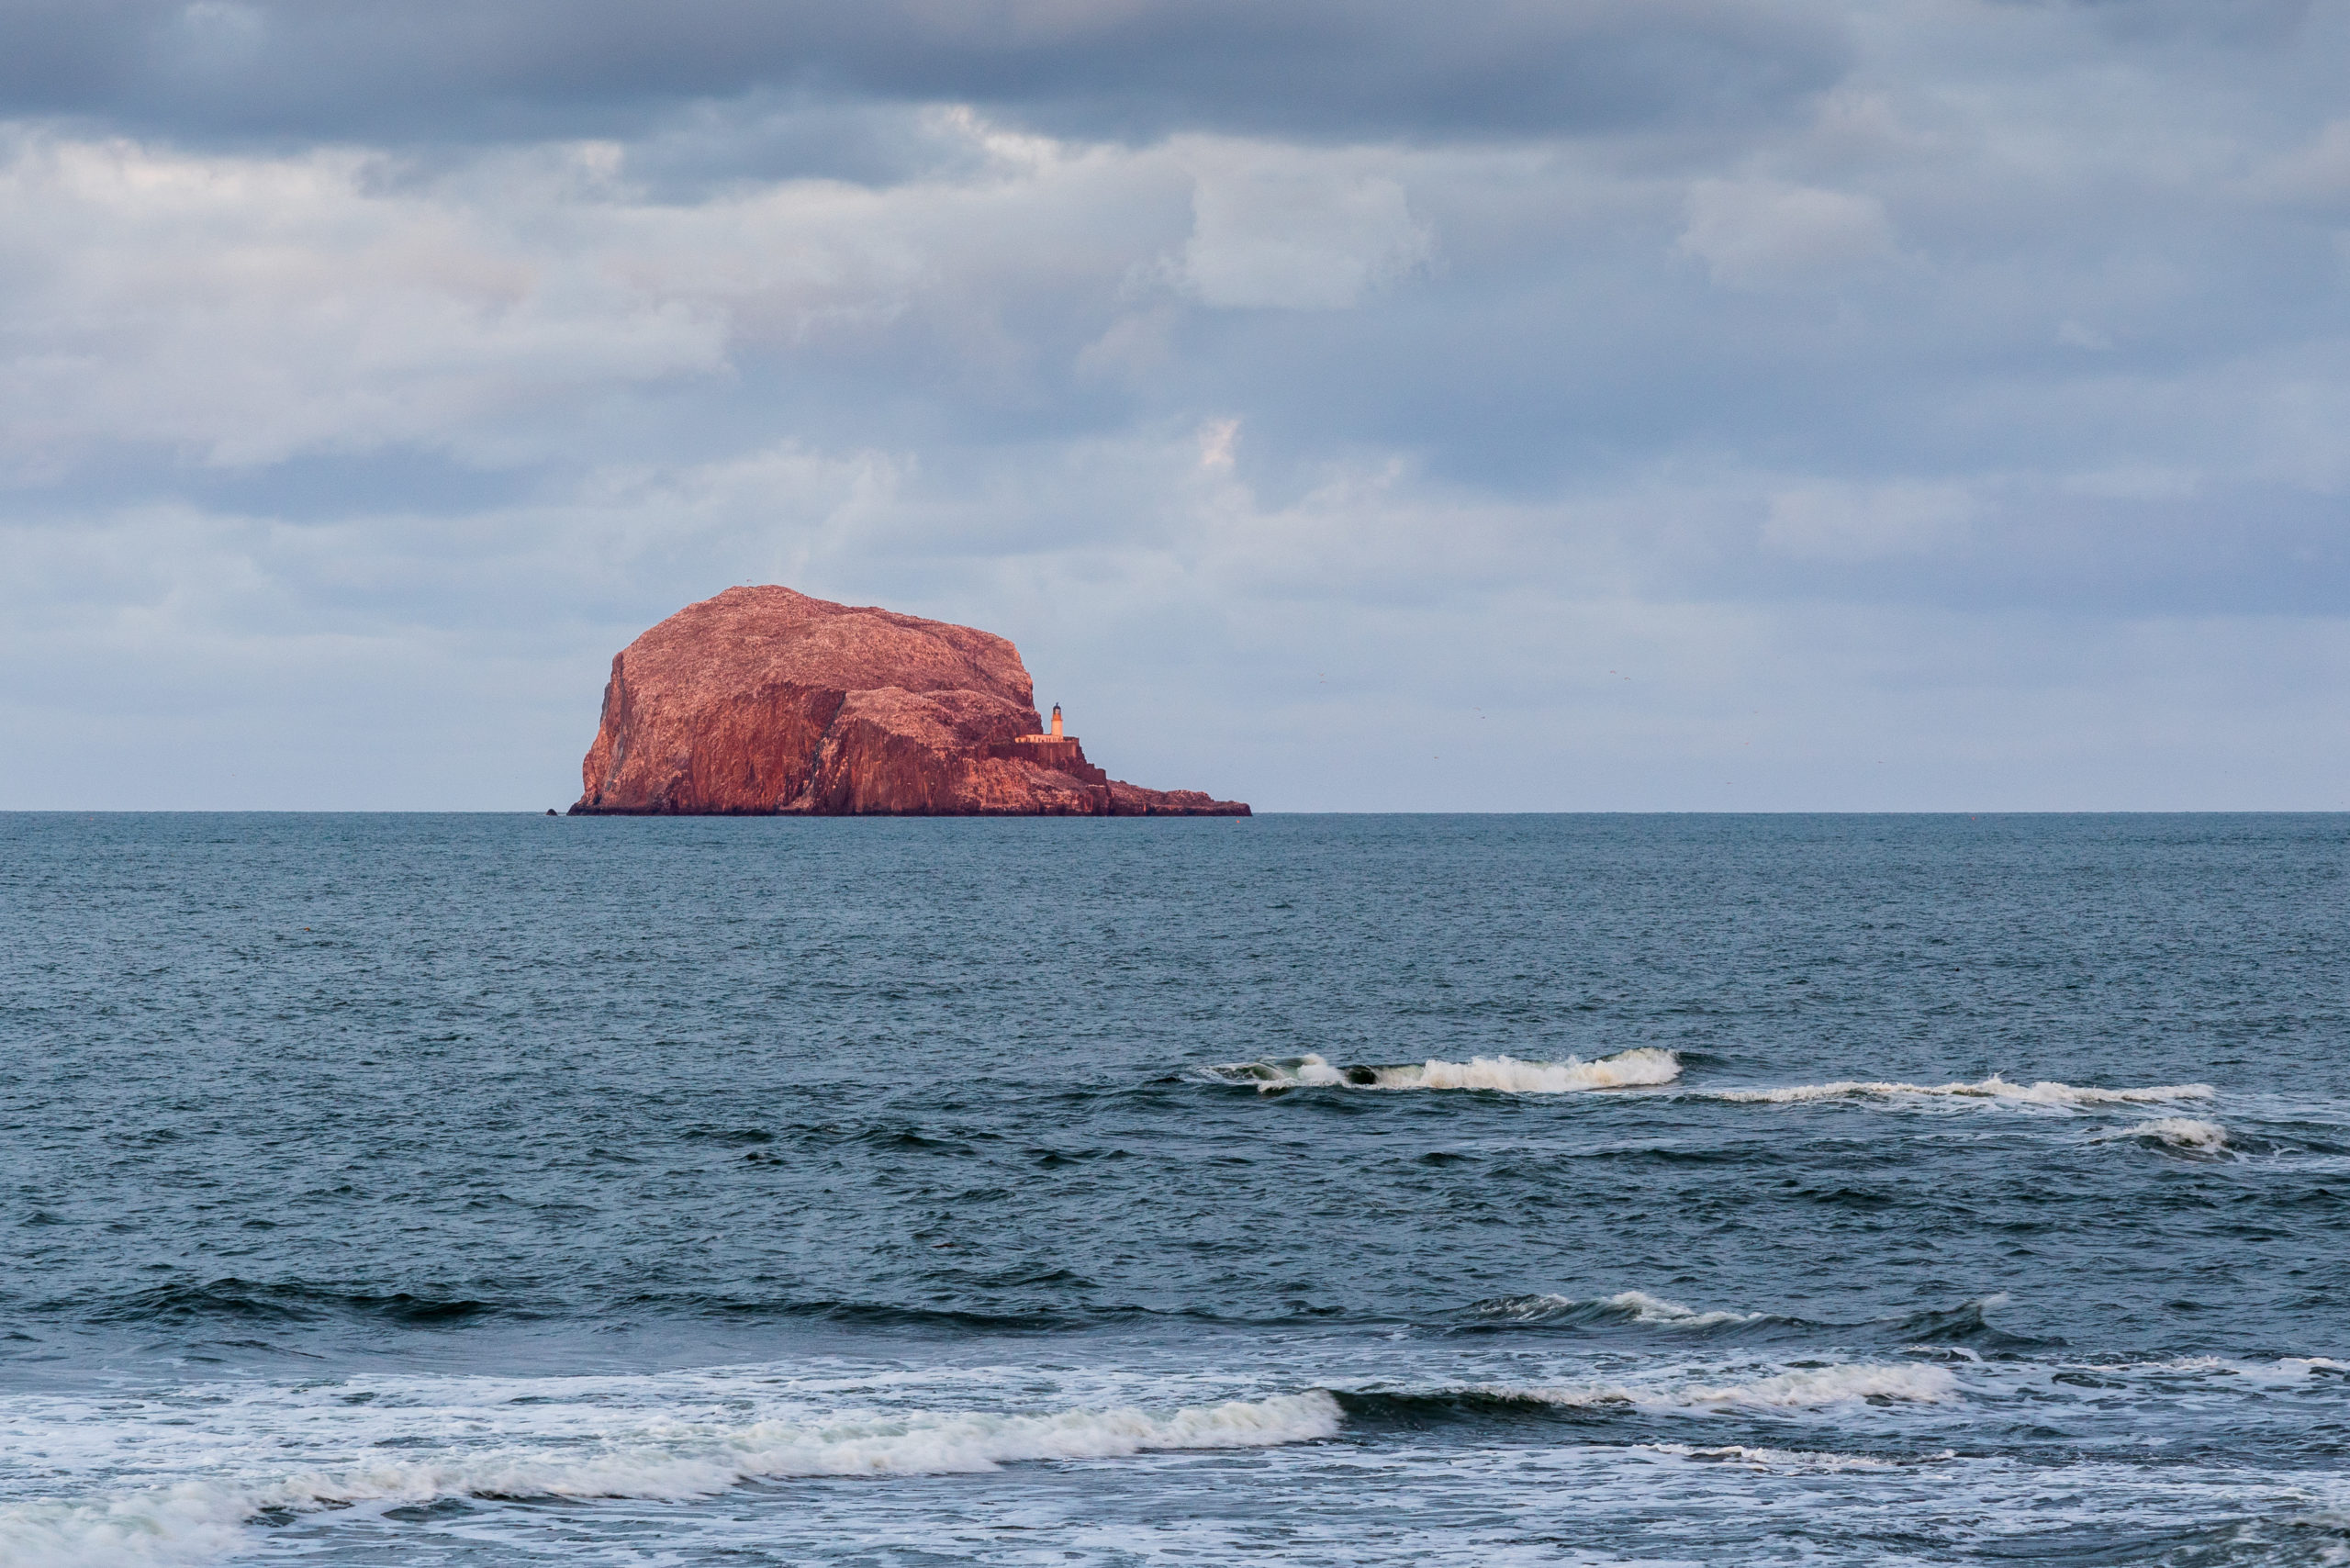 Bass Rock #1 | f/8 1/30sec ISO-400 105mm  | ILCE-7RM3